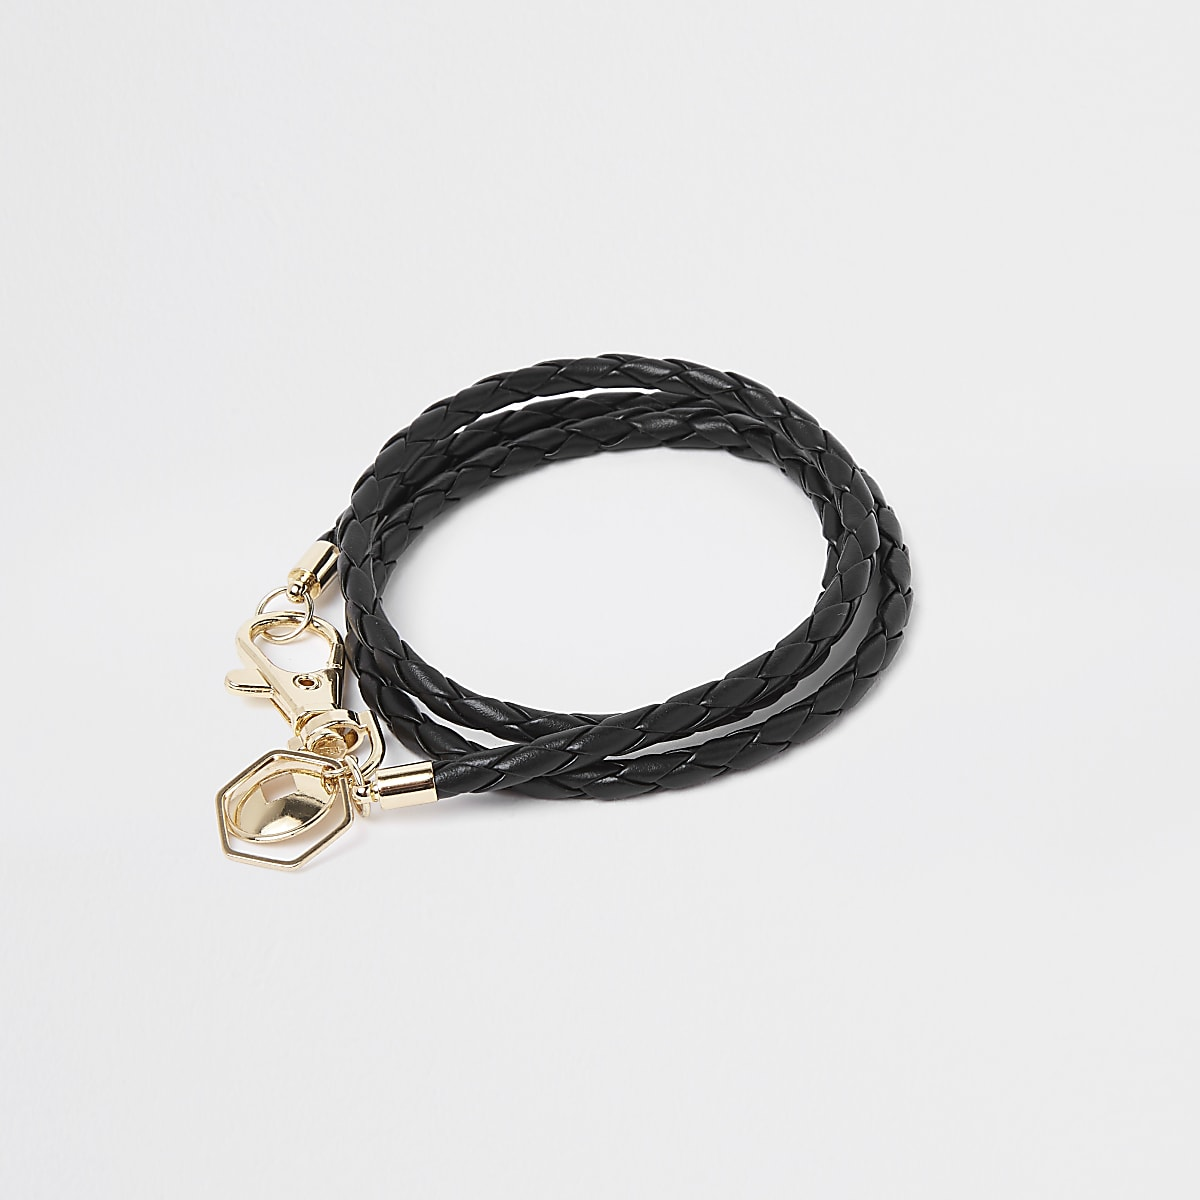 Black woven leather bracelet